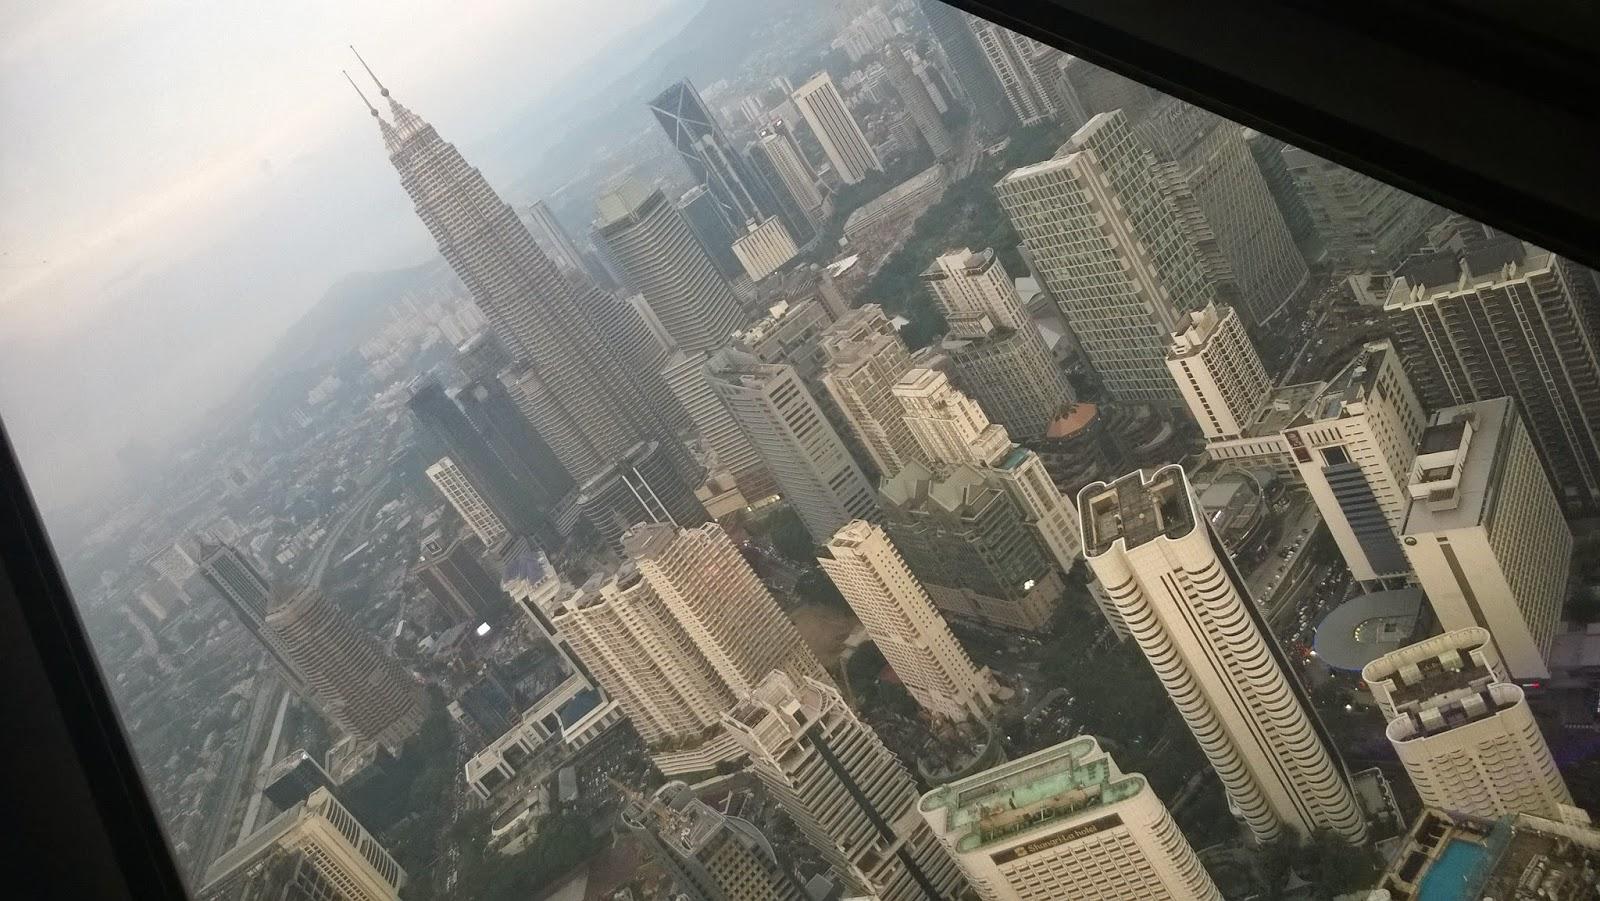 WP 20150225 020 - Travelogue - Gong Xi Fa Cai Kuala Lumpur